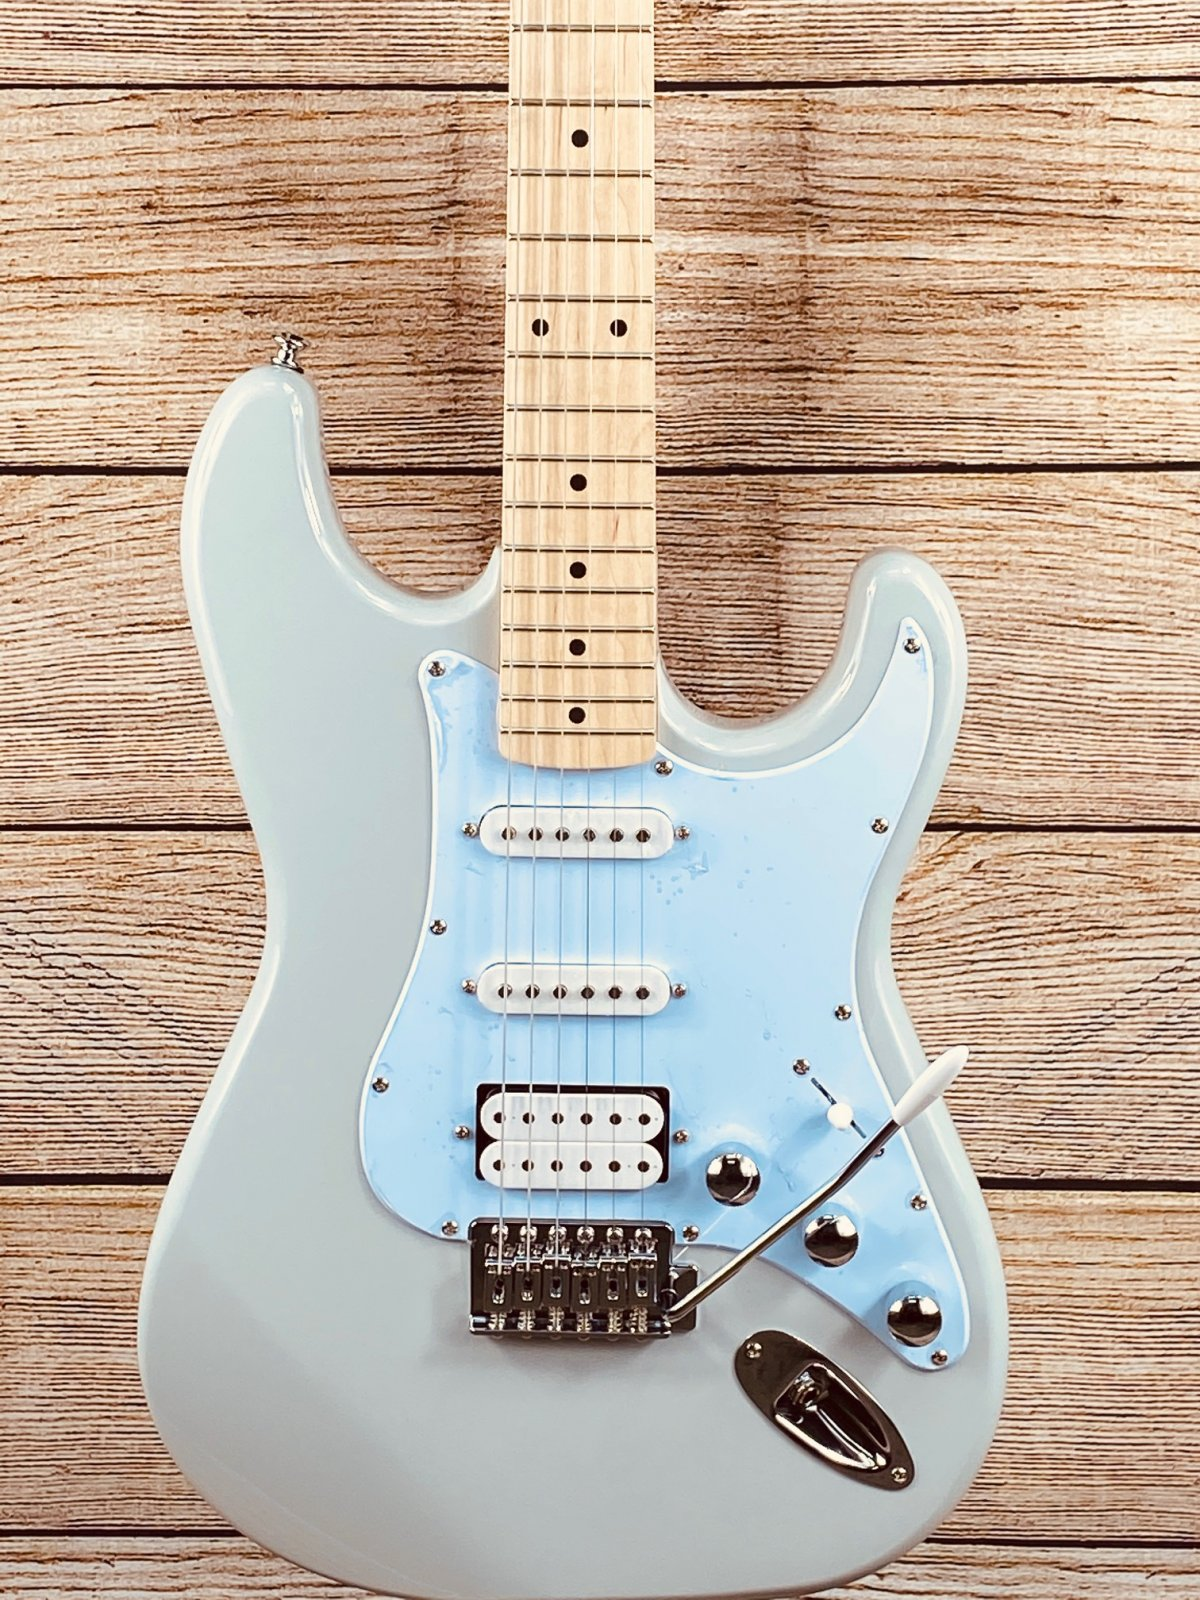 Kramer Focus VT-211S Electric Guitar - Pewter Gray